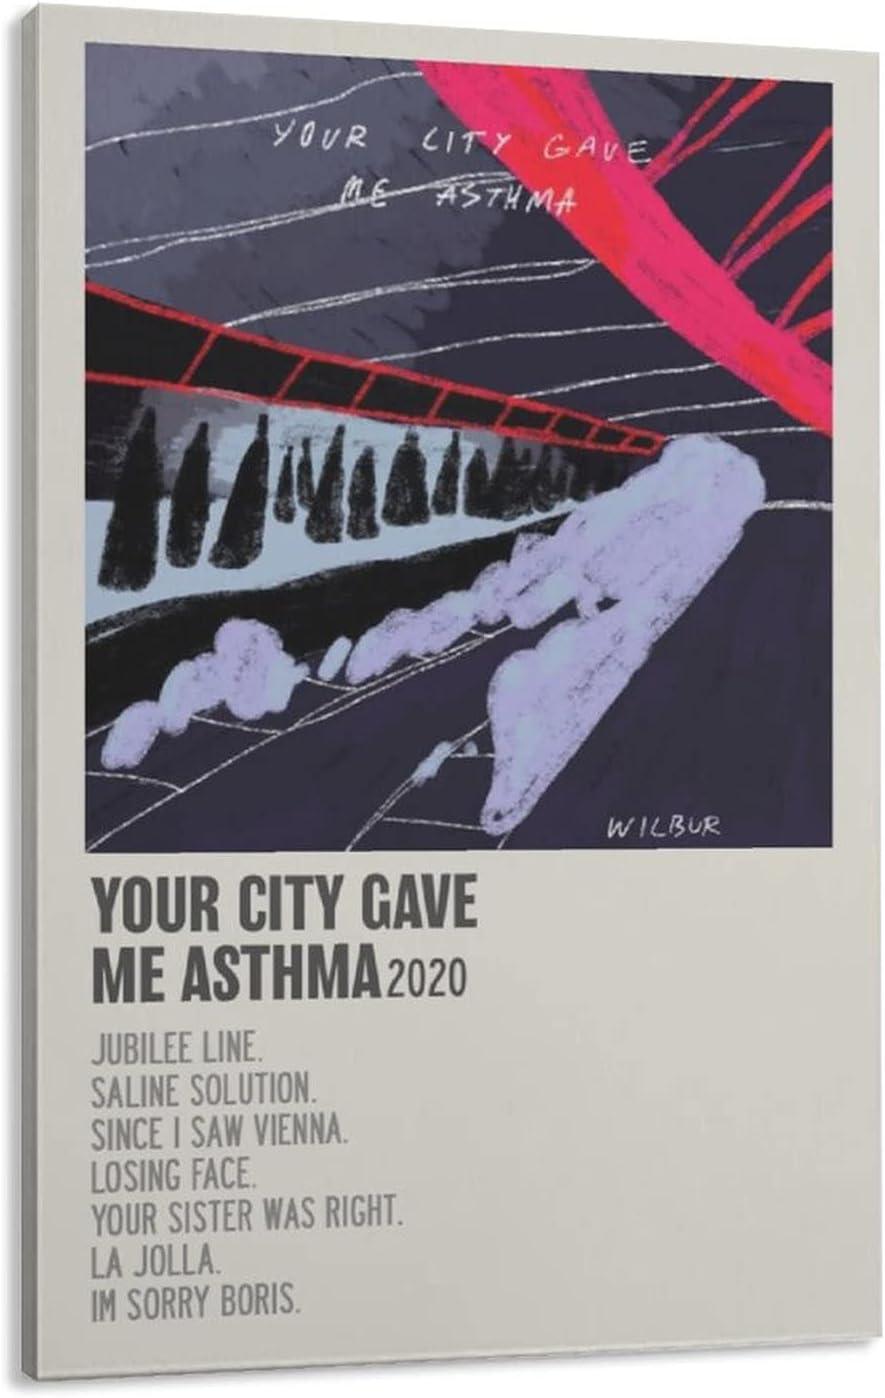 Wilbur Your City Gave Me Kansas Mall Asthma Art Charlotte Mall Canvas De Wall Poster